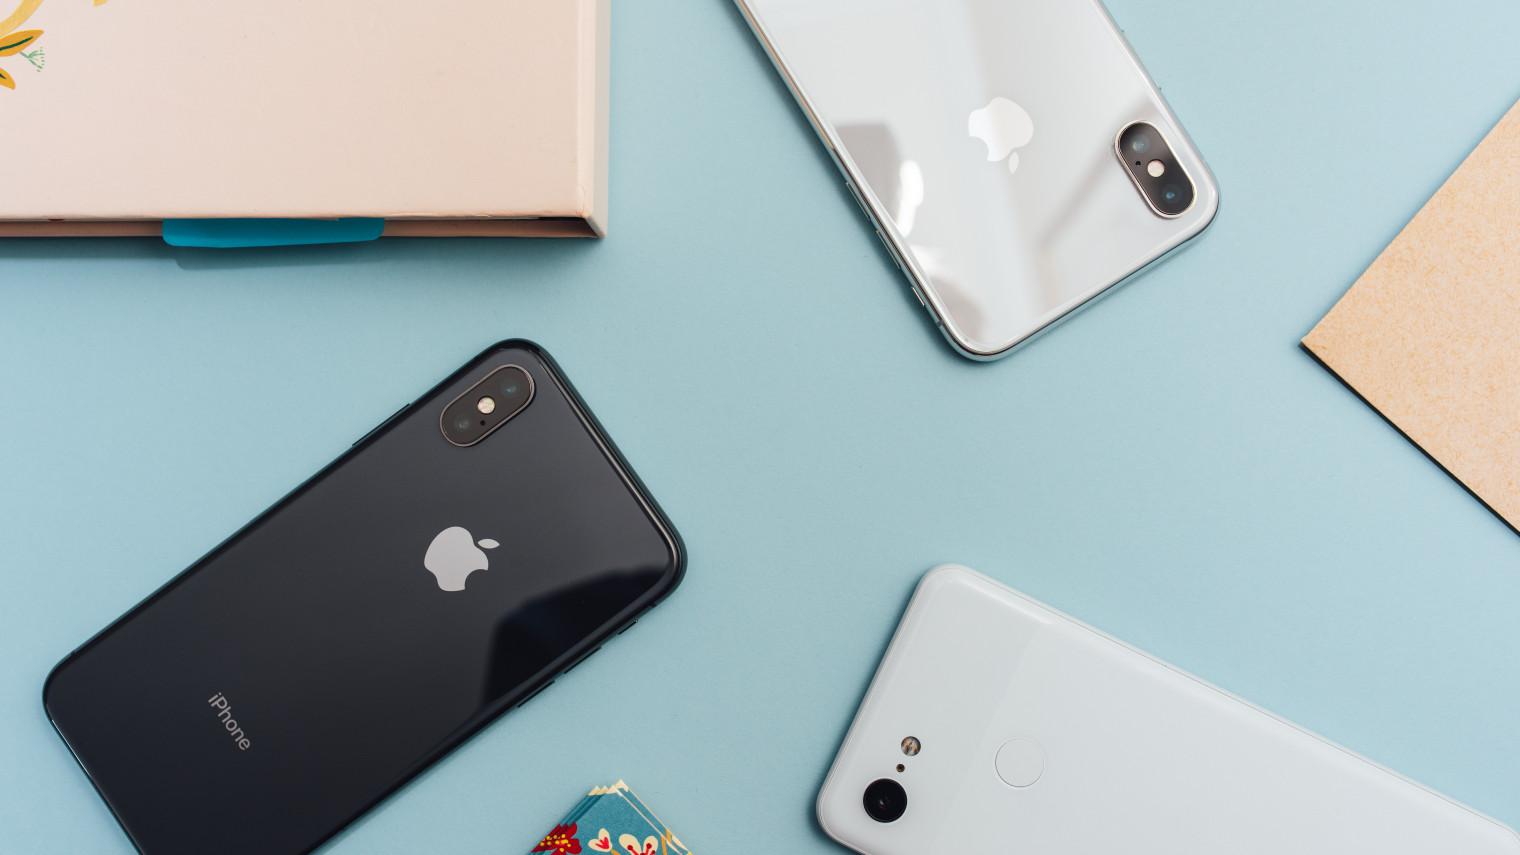 iPhone 13全线降价,小米们还能赢回高端市场吗?